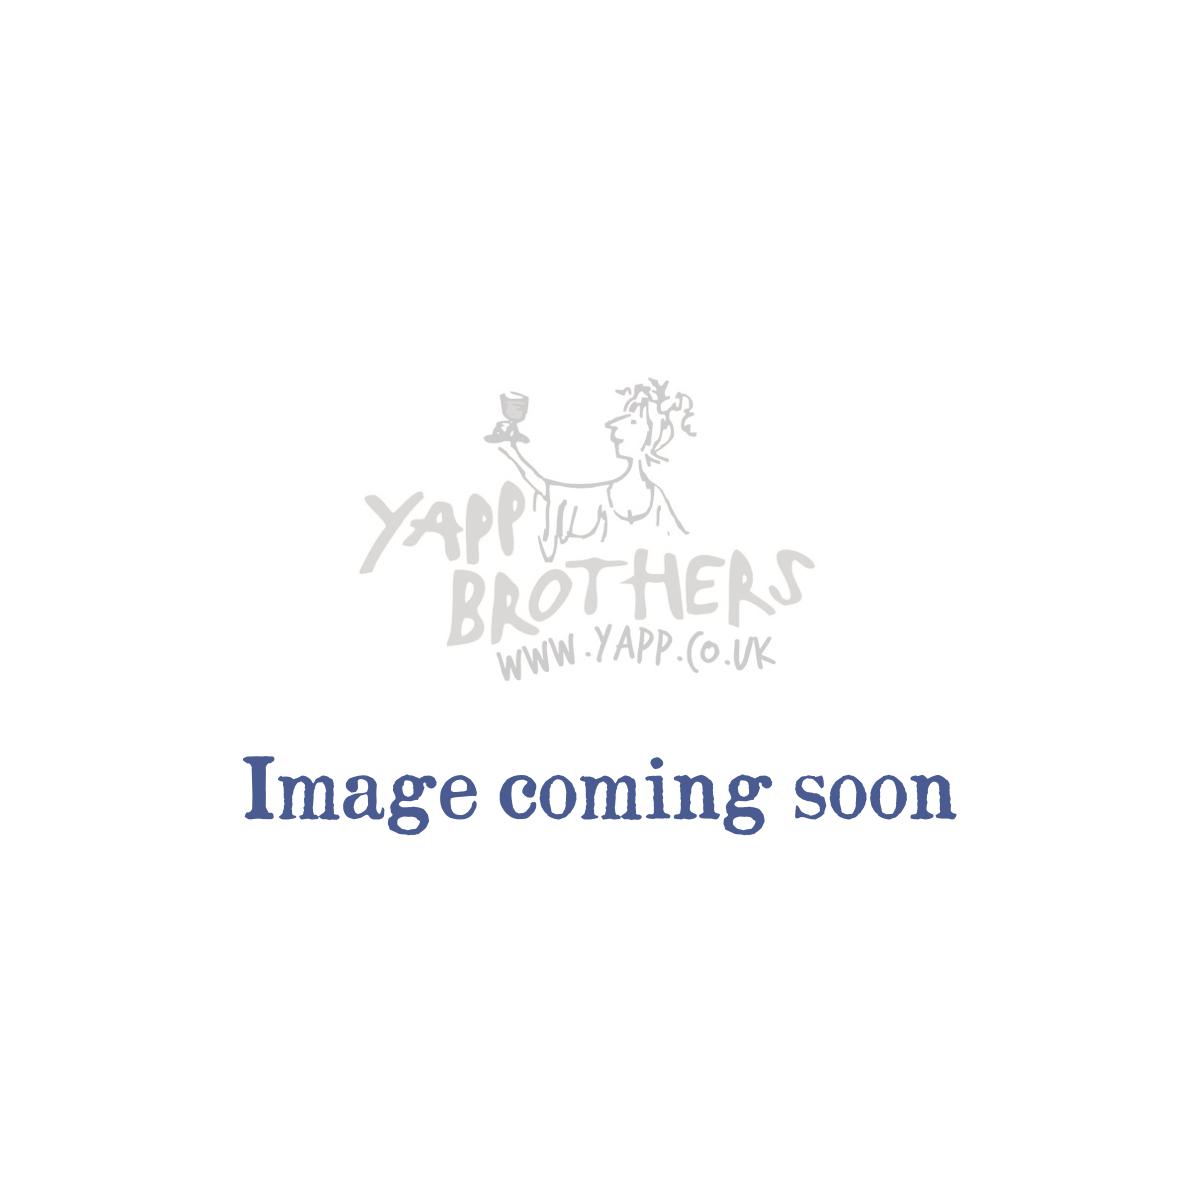 Jasper Hill: Emily's Paddock Shiraz - Cabernet Franc 2017 - Bottle